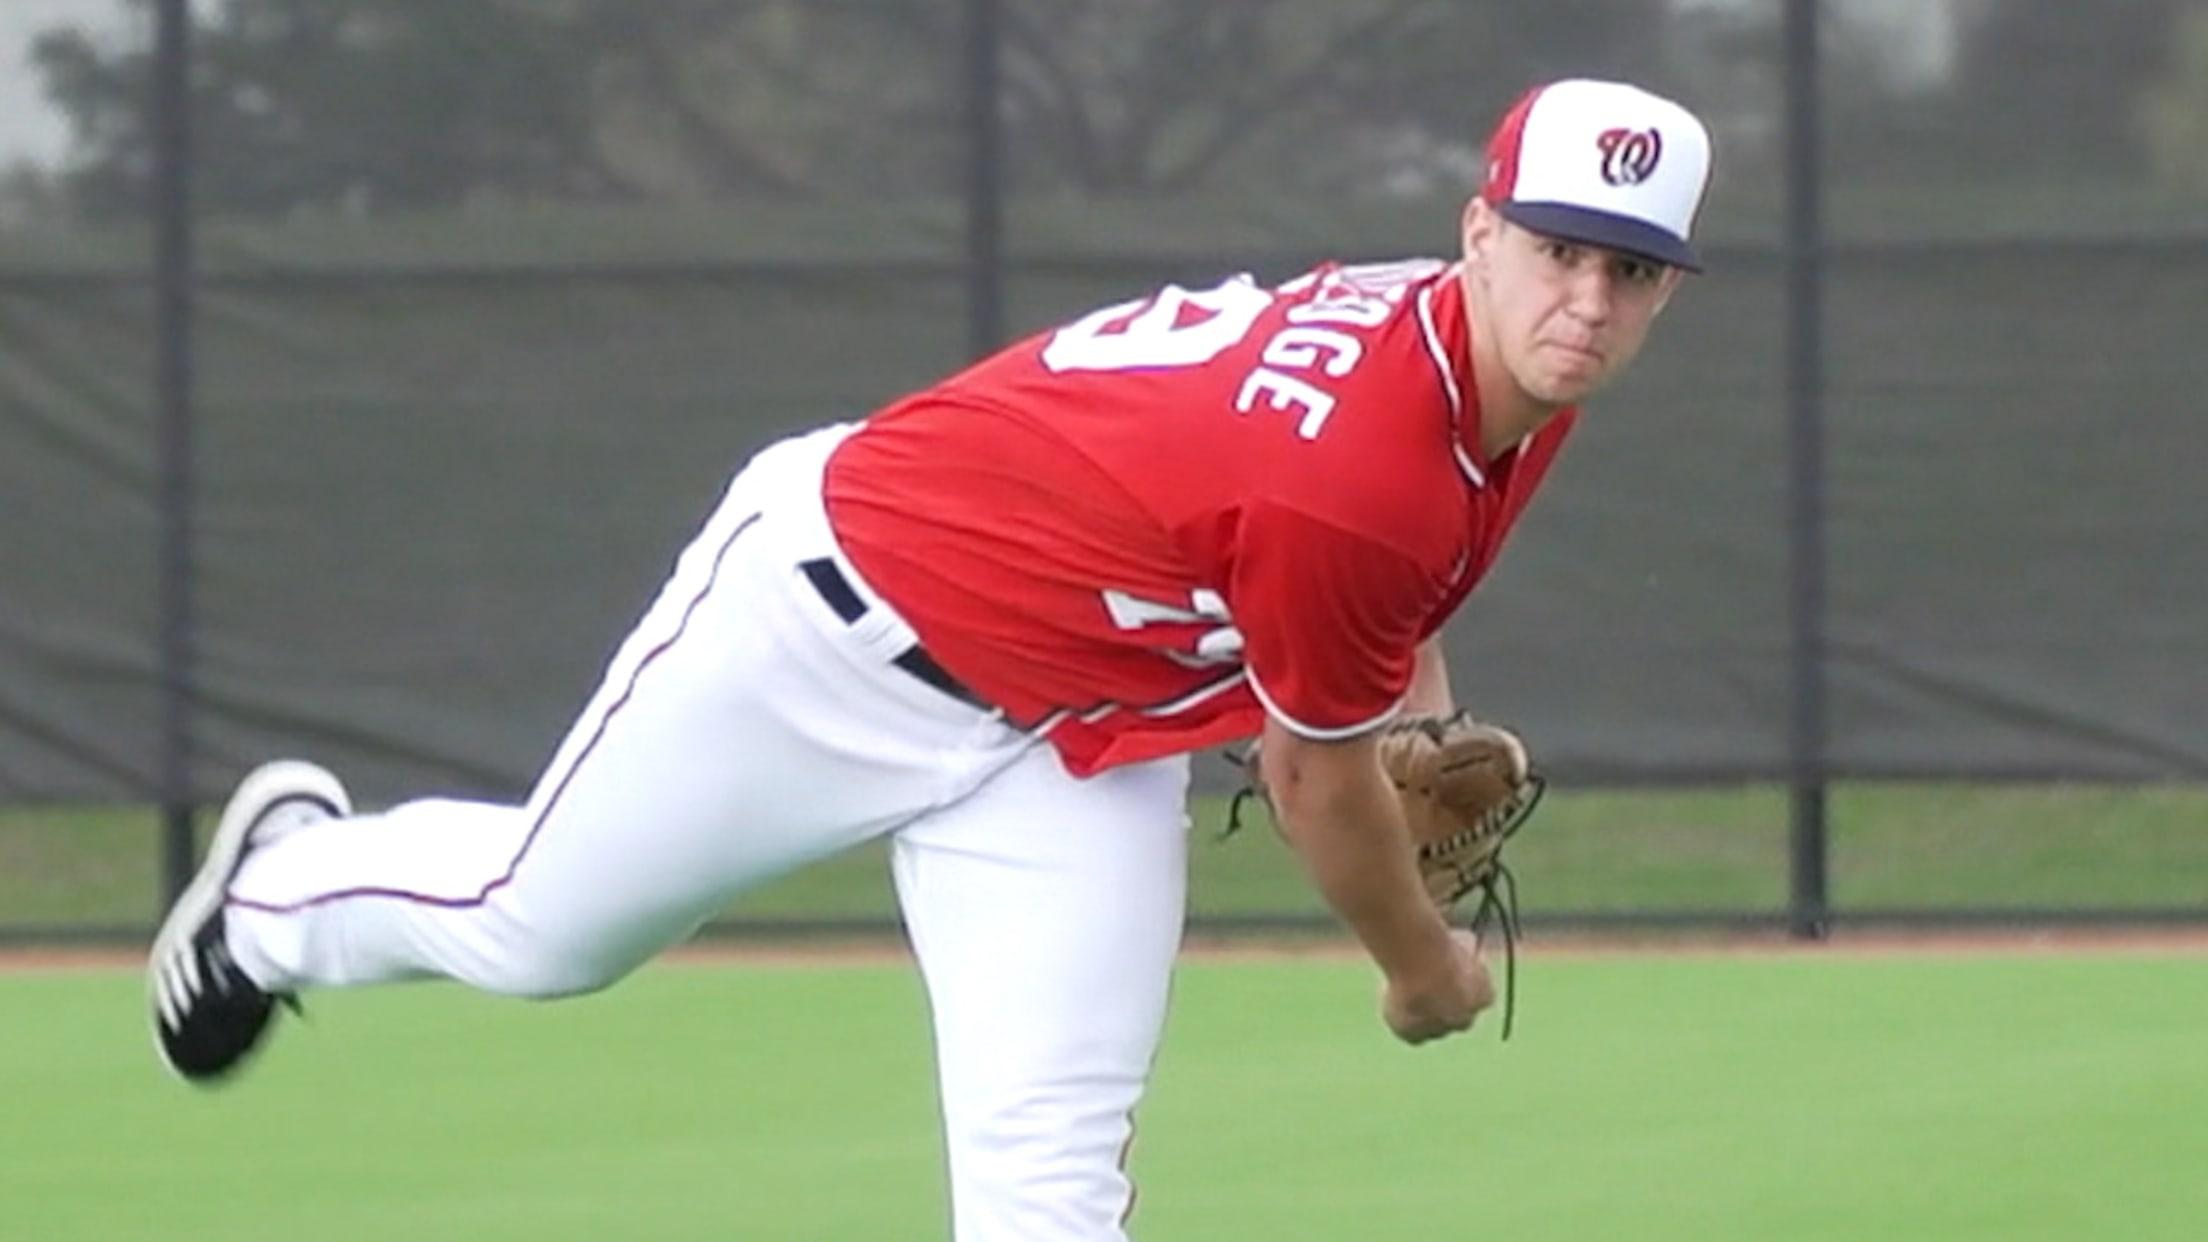 Top Prospects: Jackson Rutledge